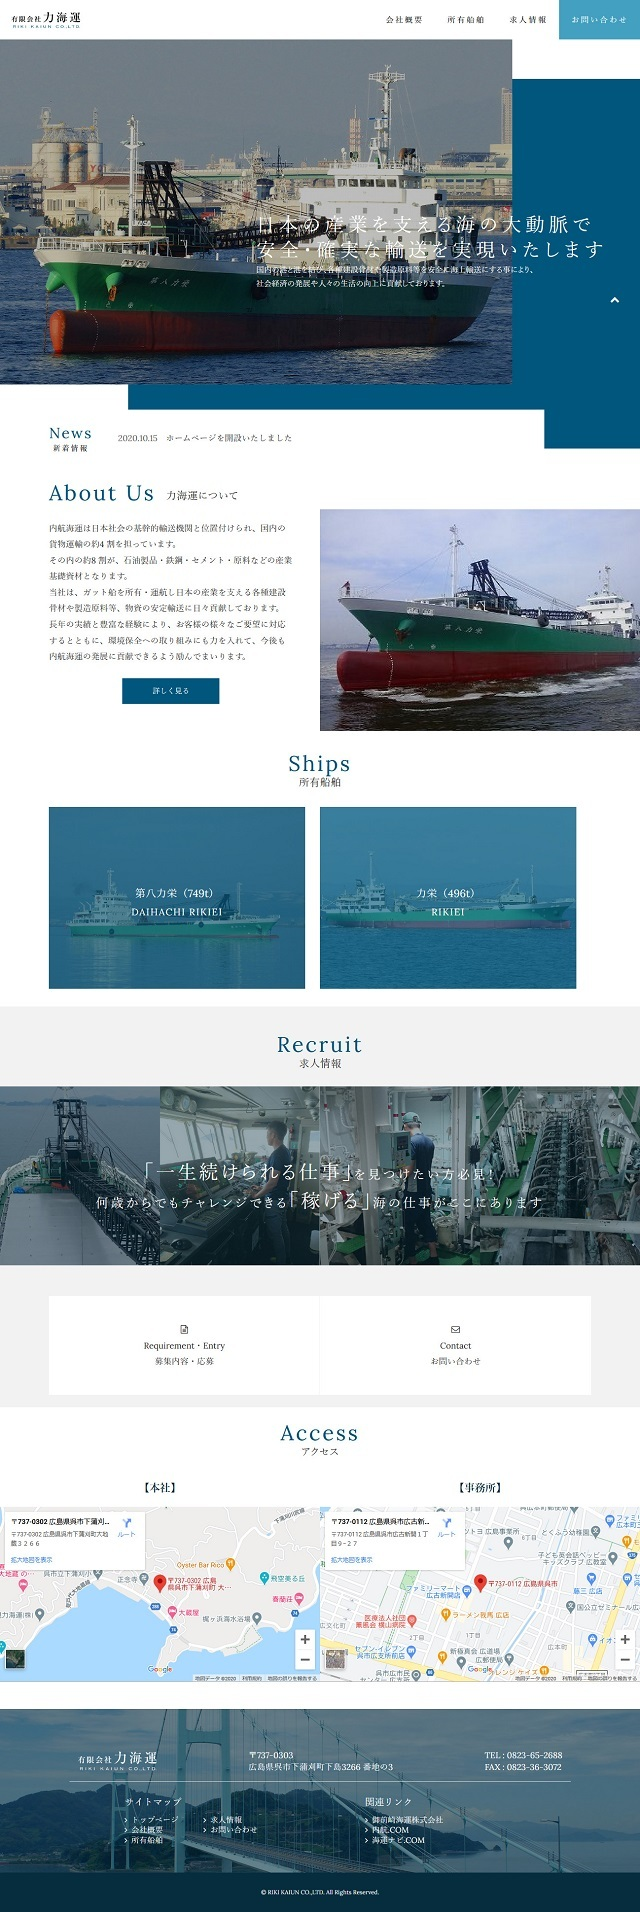 Screenshot_2020-10-20 有限会社 力海運 – 日本の産業を支える海の大動脈で安全・確実な輸送を実現いたします